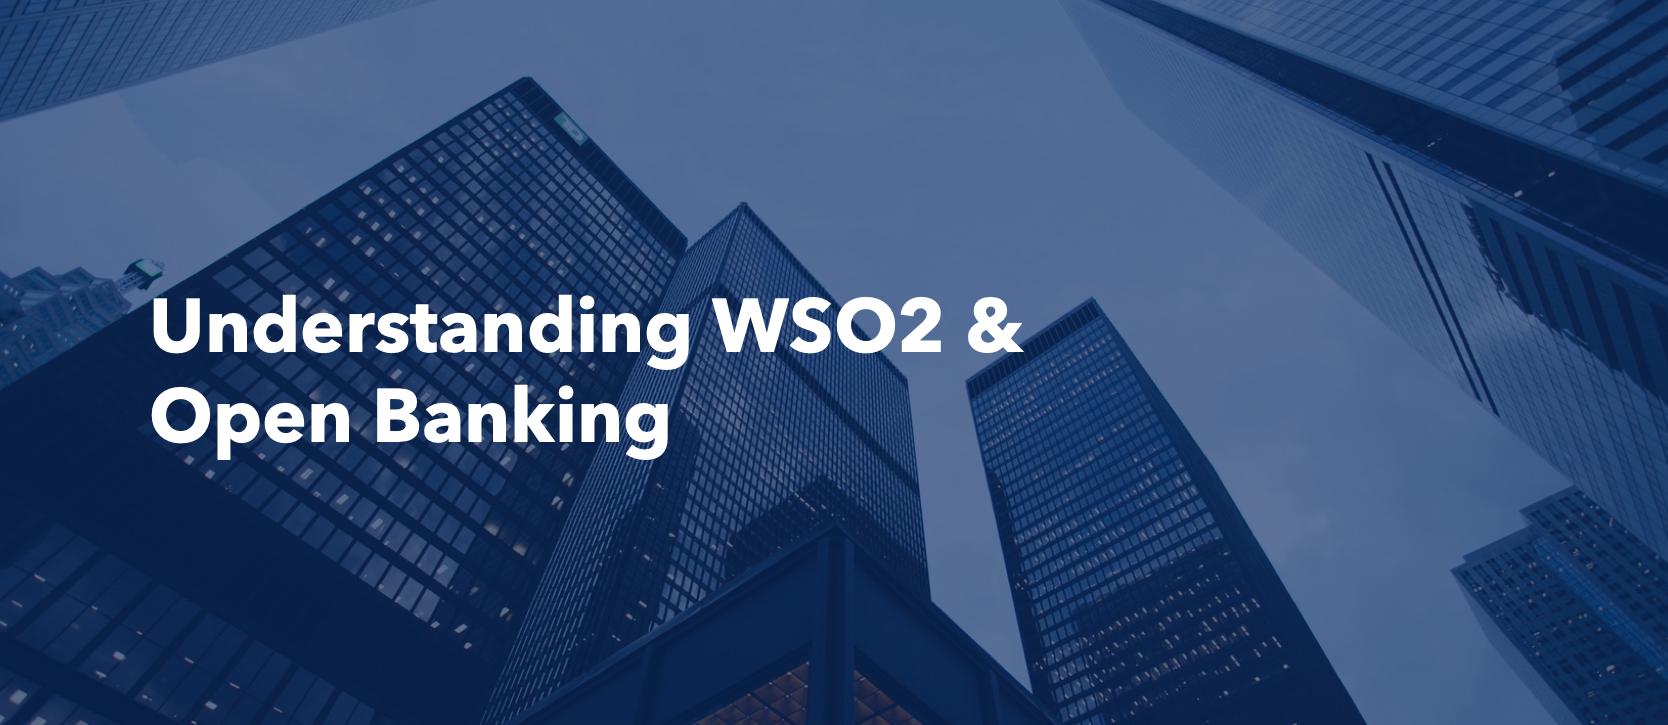 Understanding WSO2 & Open Banking